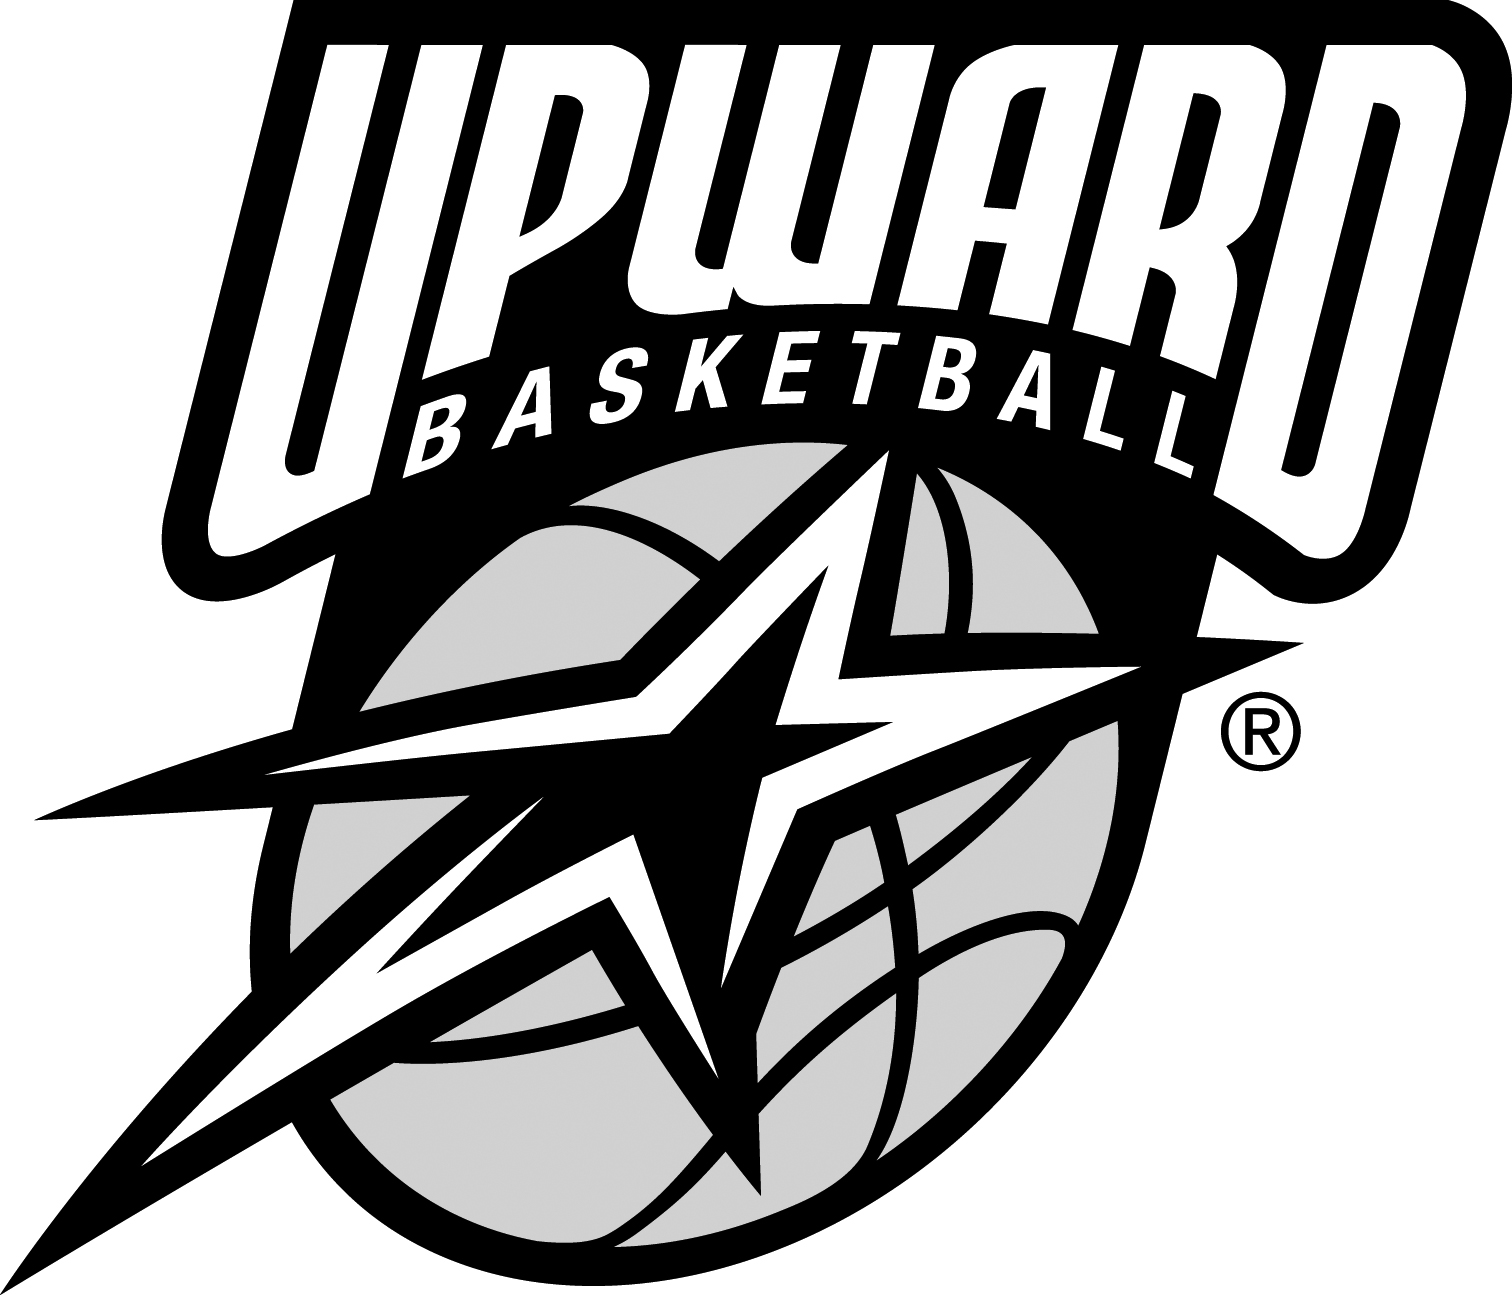 Upward basketball clipart vector freeuse download Home vector freeuse download